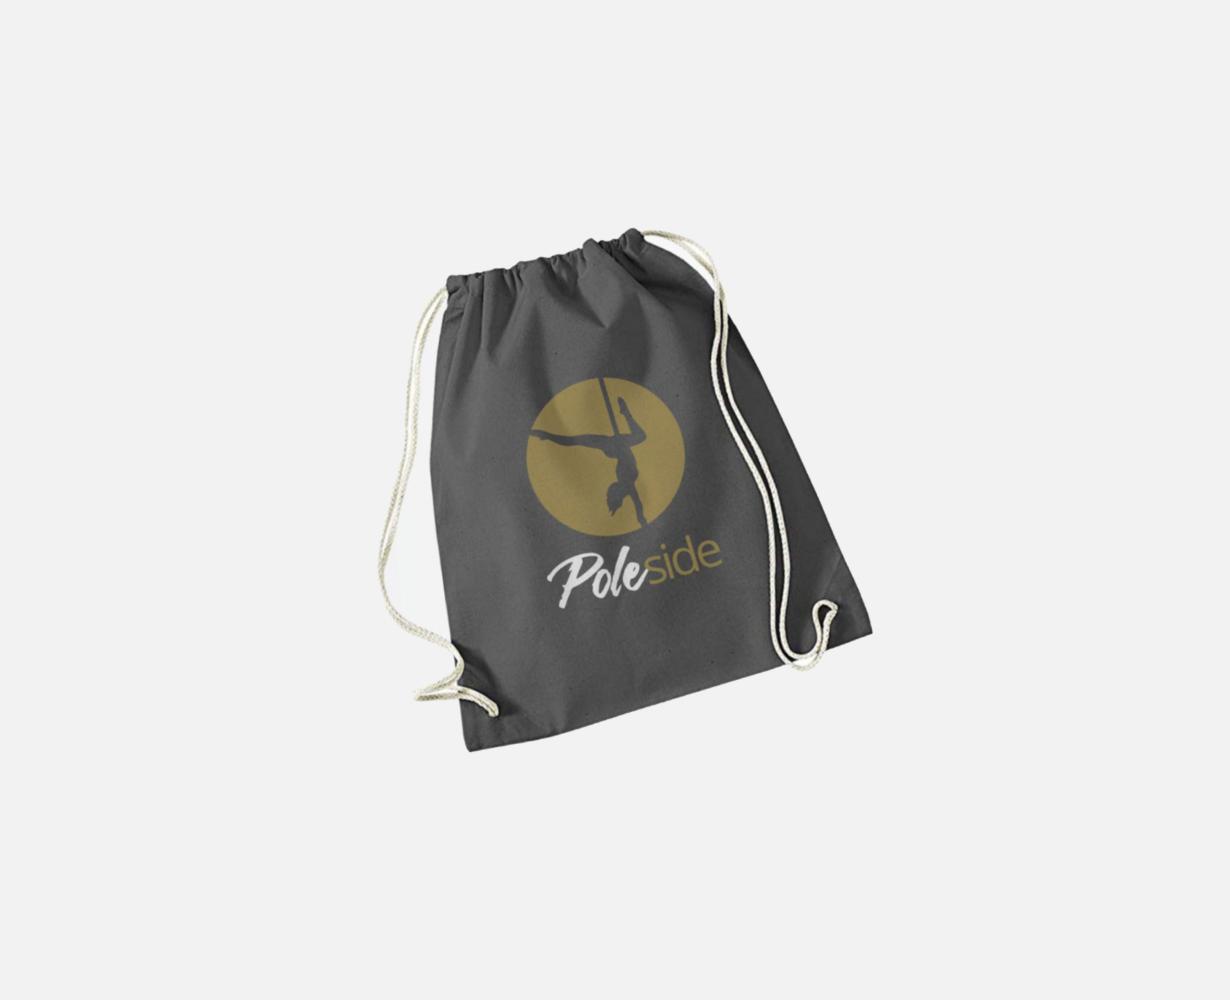 POLEside Sportbag